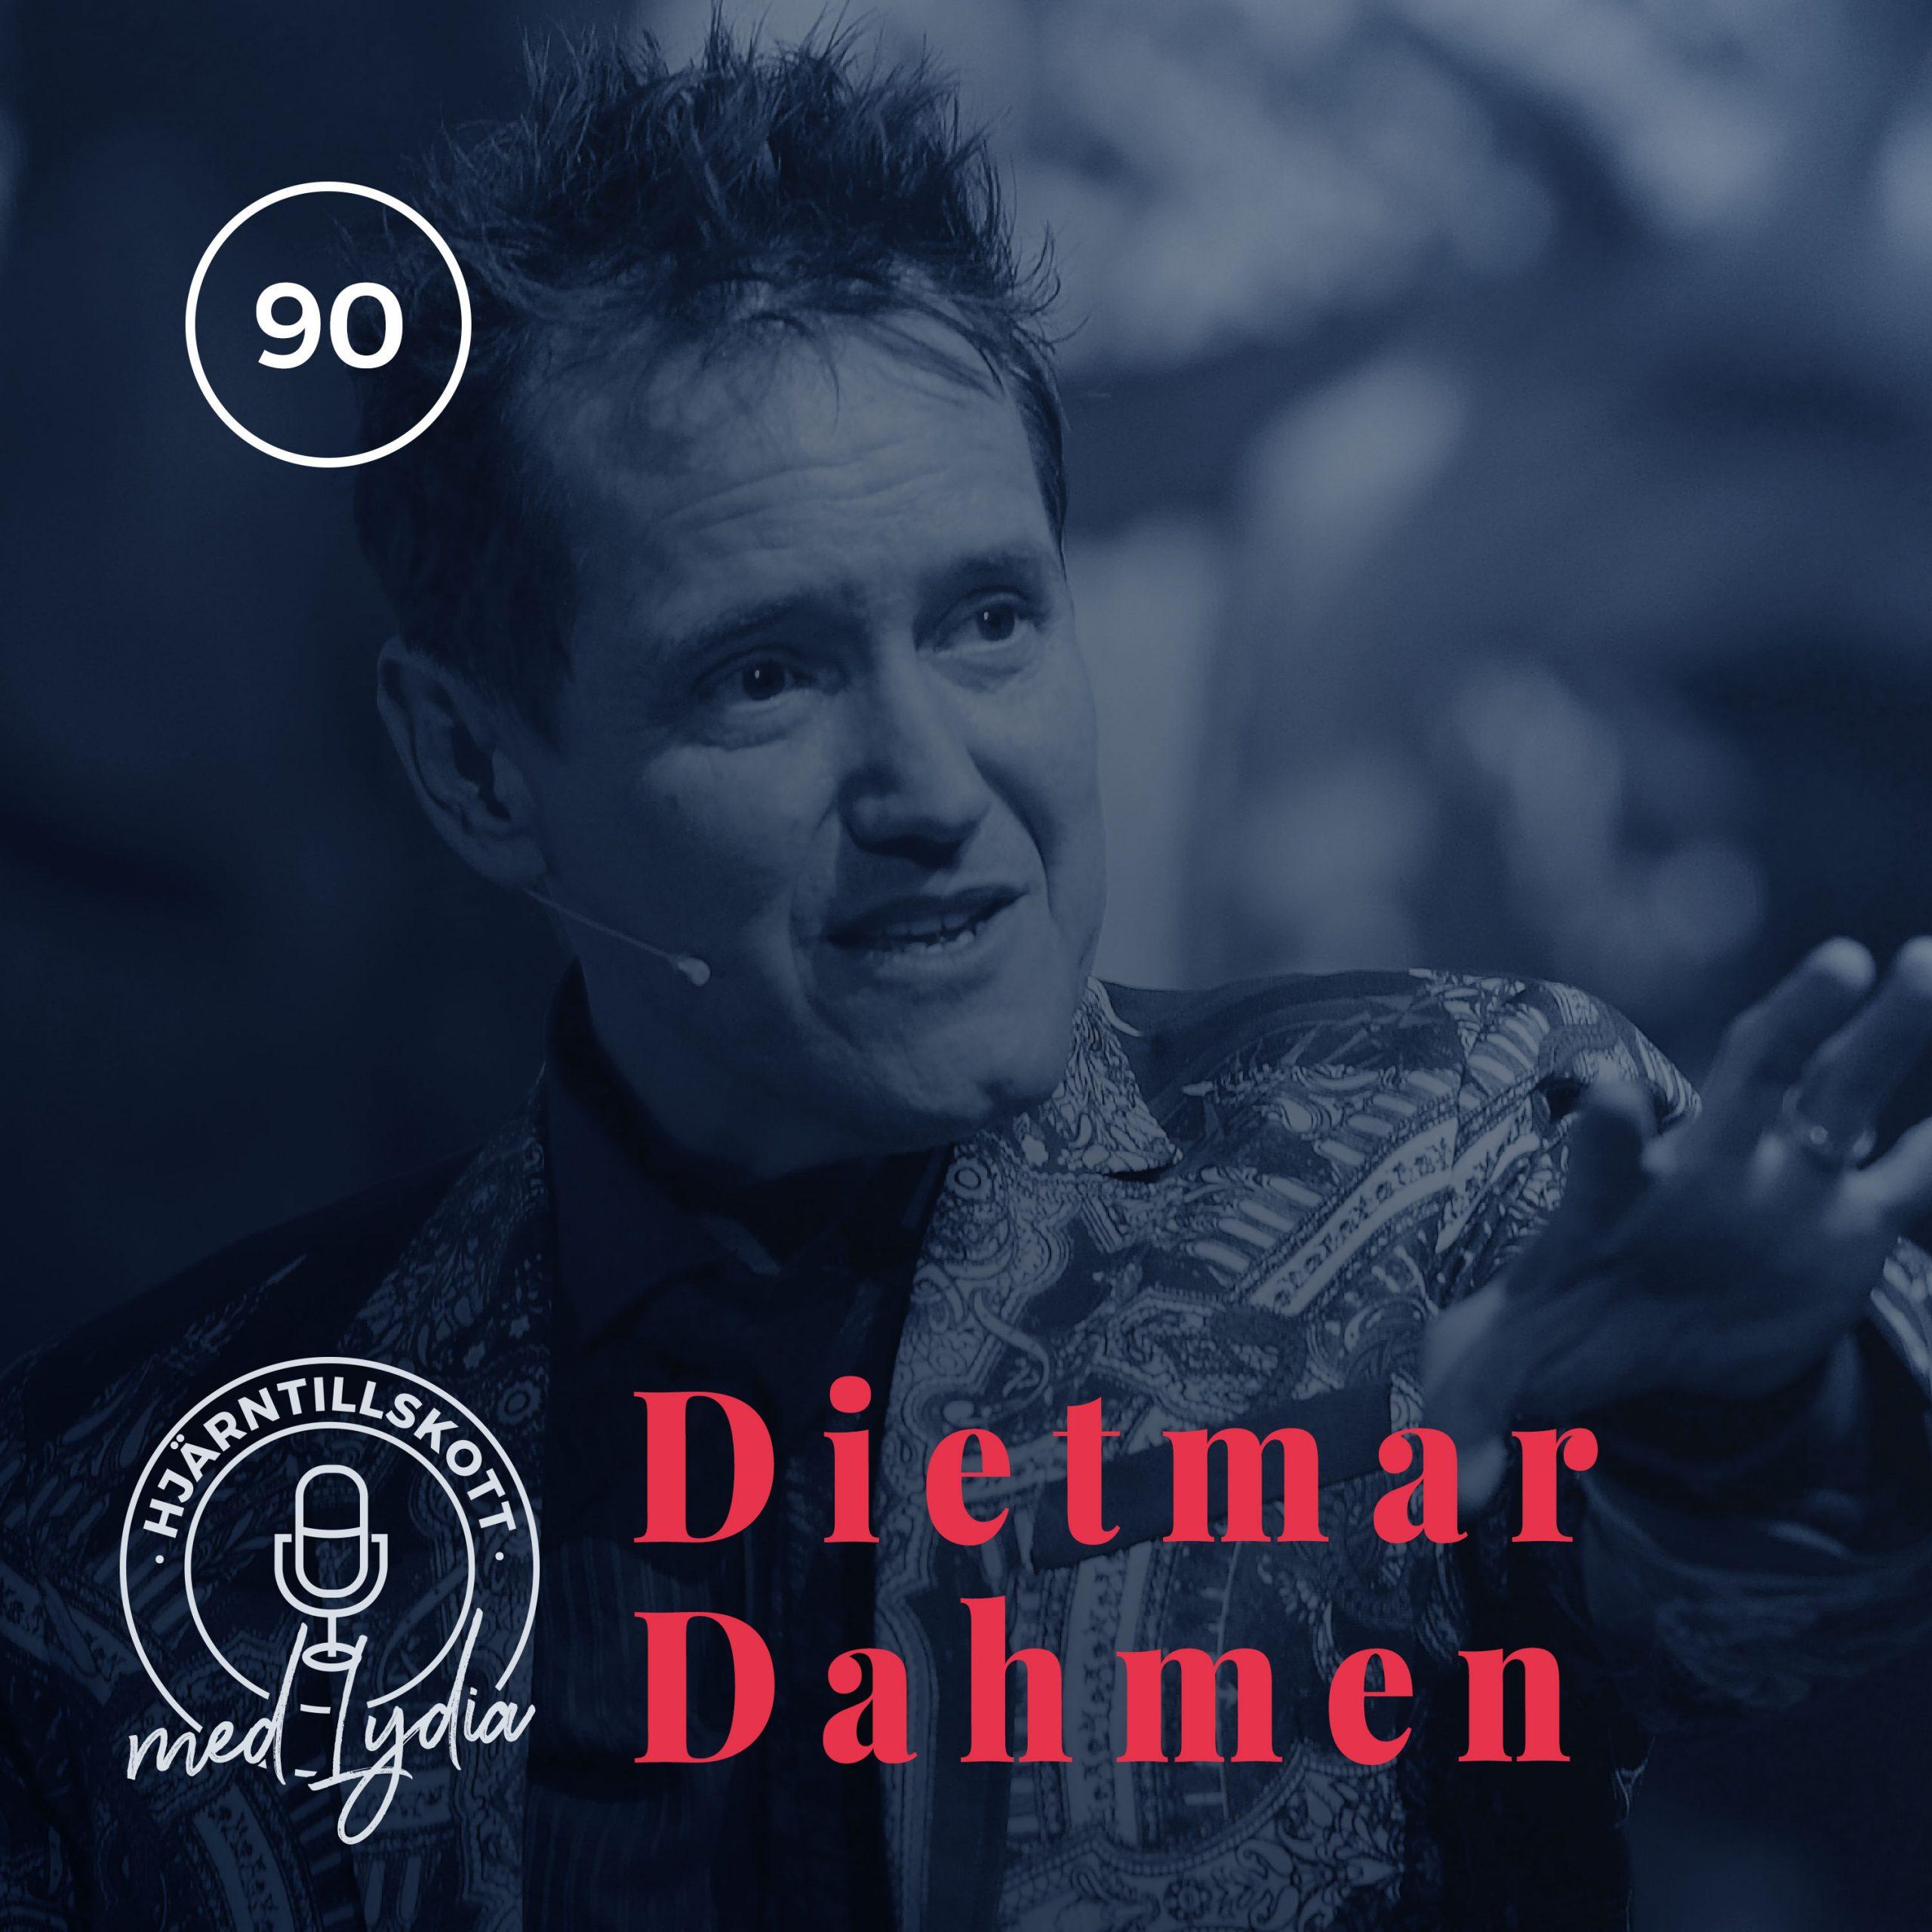 90. Dietmar Dahmen – The Inspirator